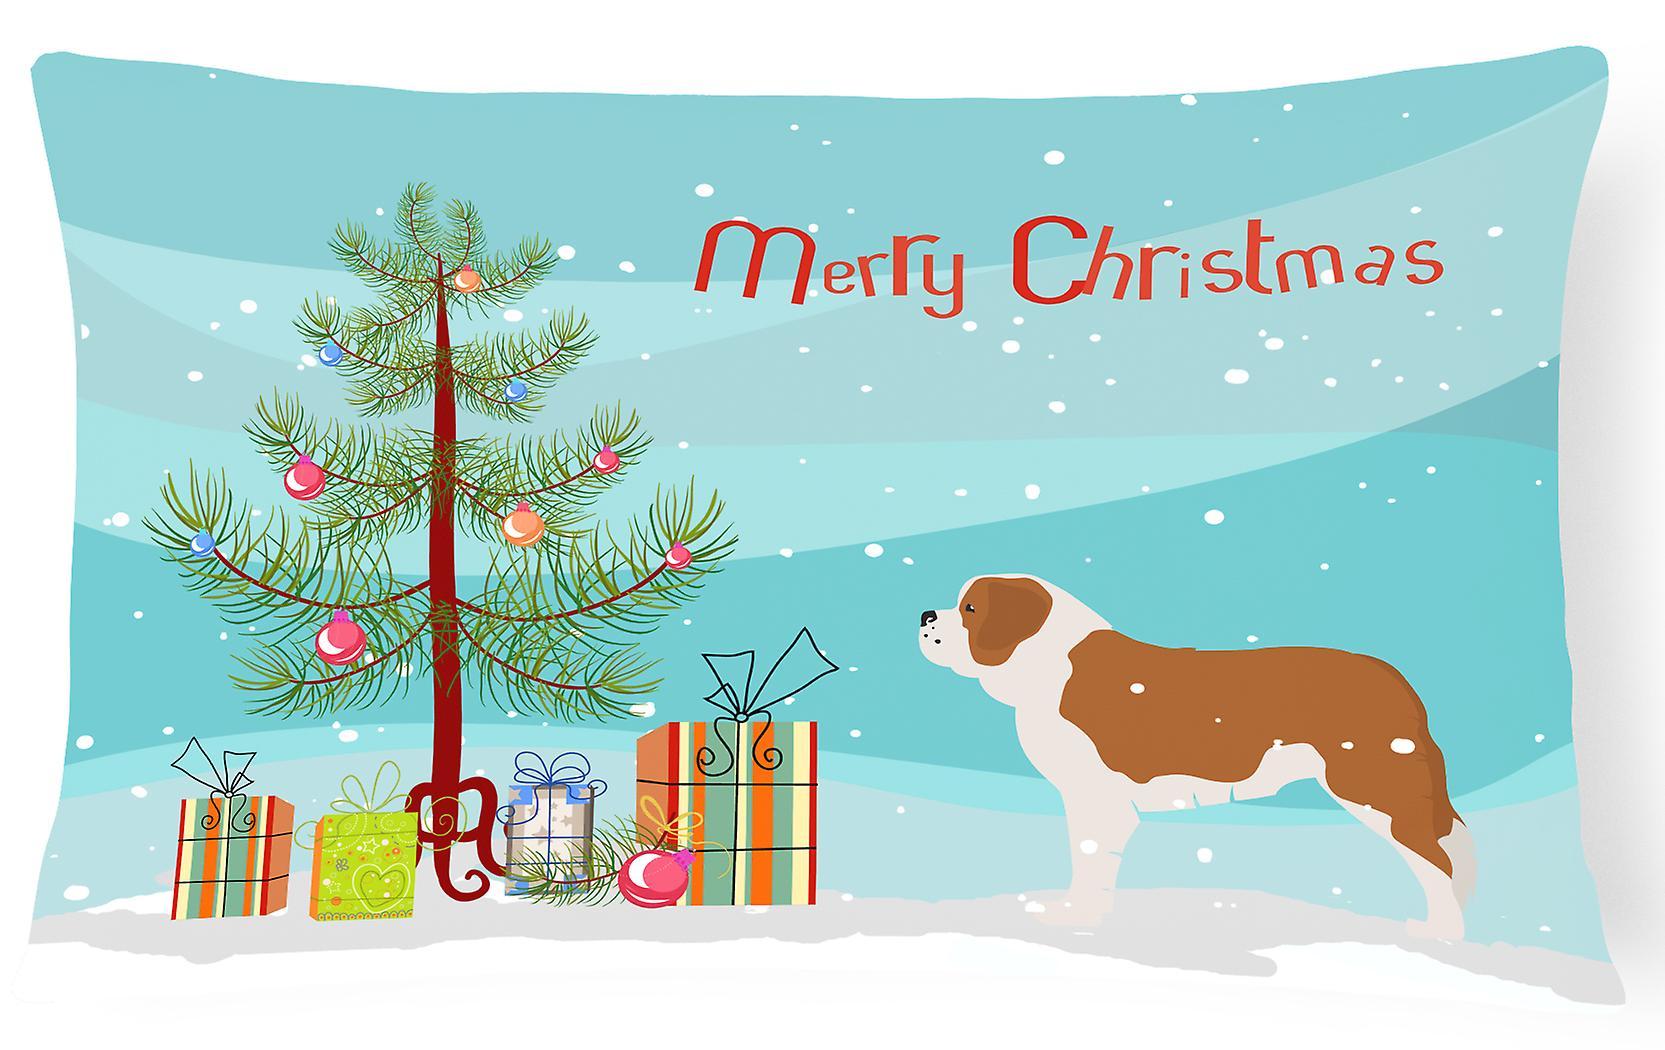 Merry Tissu Christmas Toile Décoratif Saint Tree Oreiller Bernard l13uKcTFJ